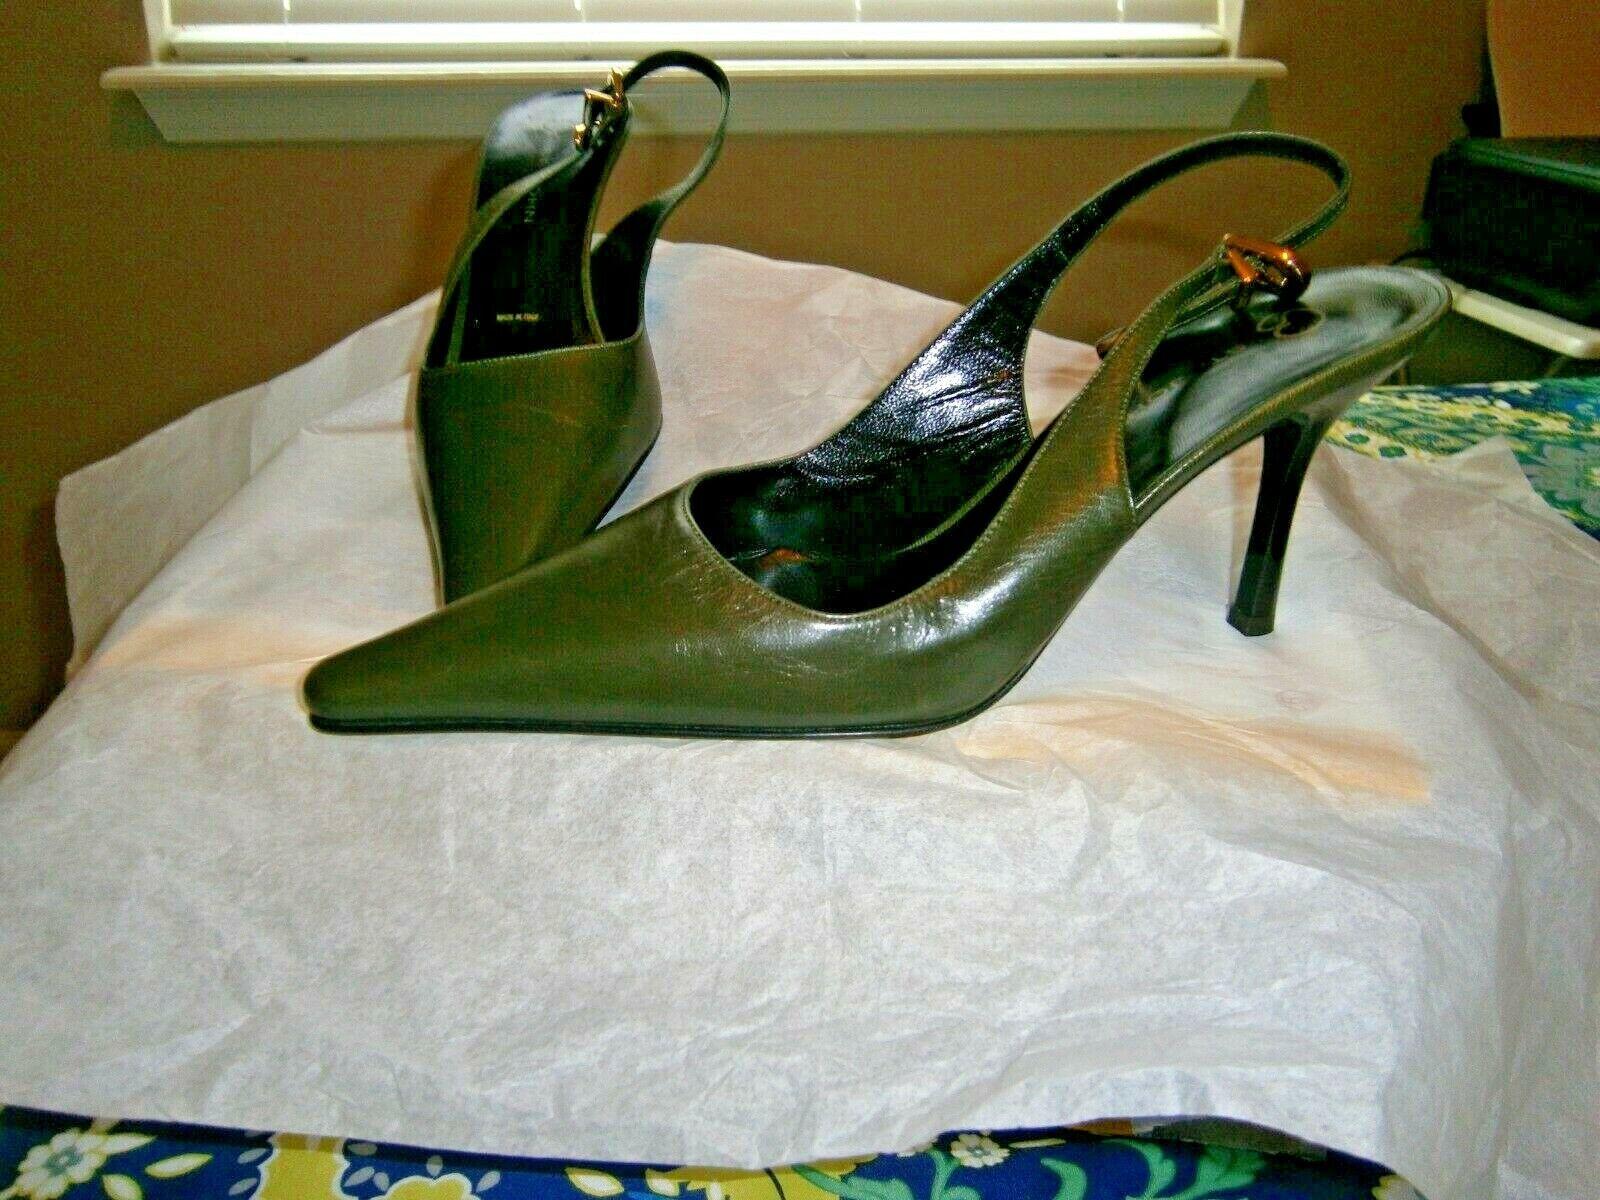 St John Made in  Dark Green Leather 3  Heel Slingback Pumps Sz 7.5B